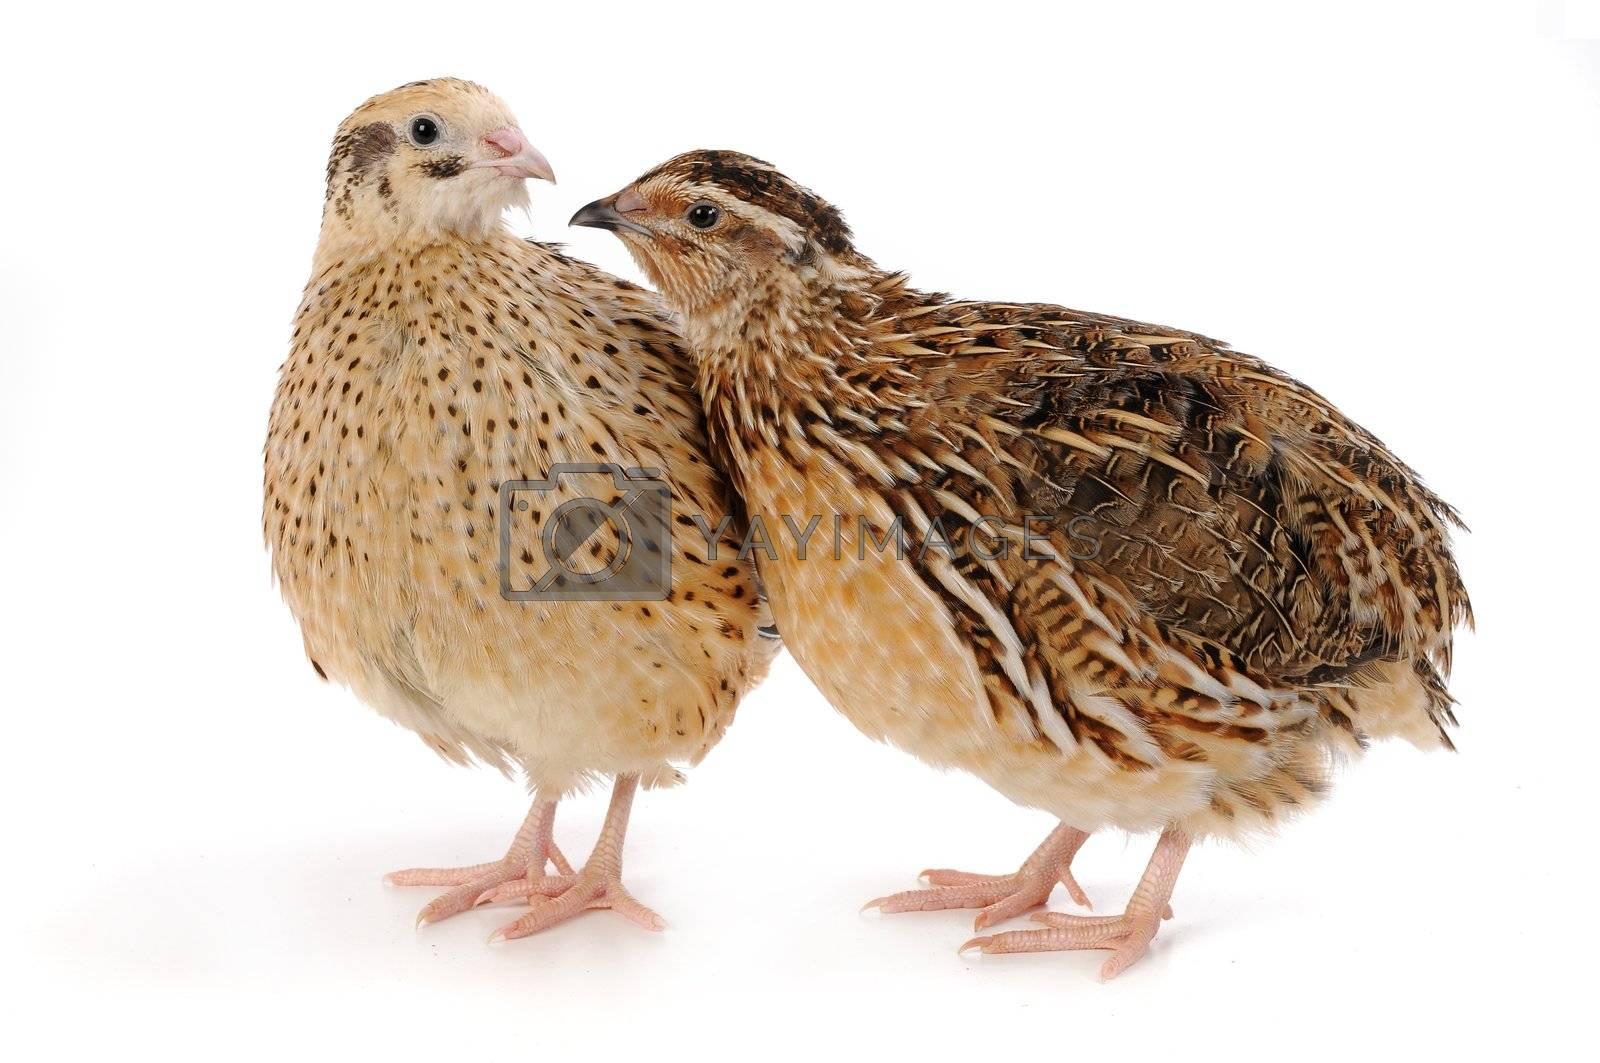 adult quail isolated on white background